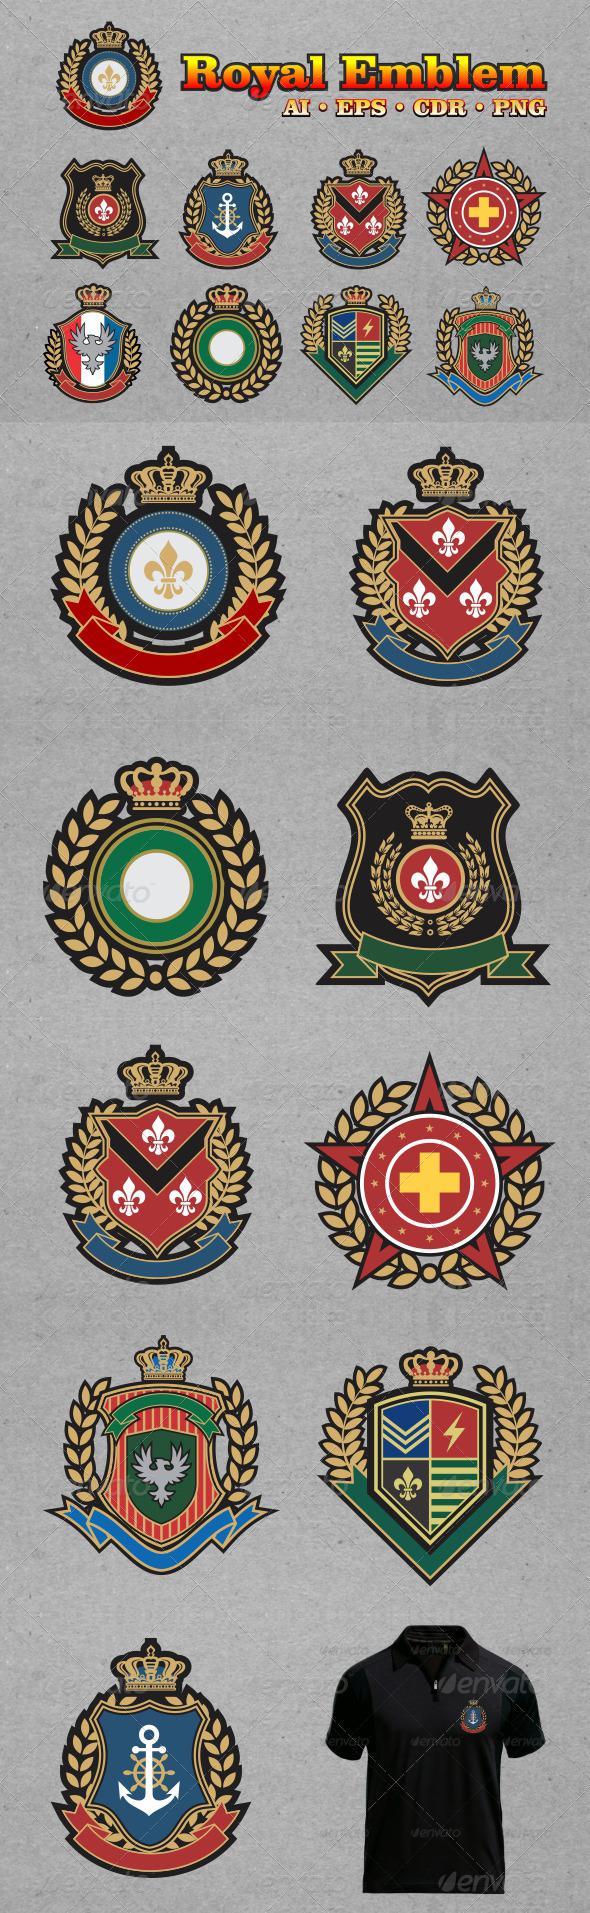 GraphicRiver Royal Emblem 6416040